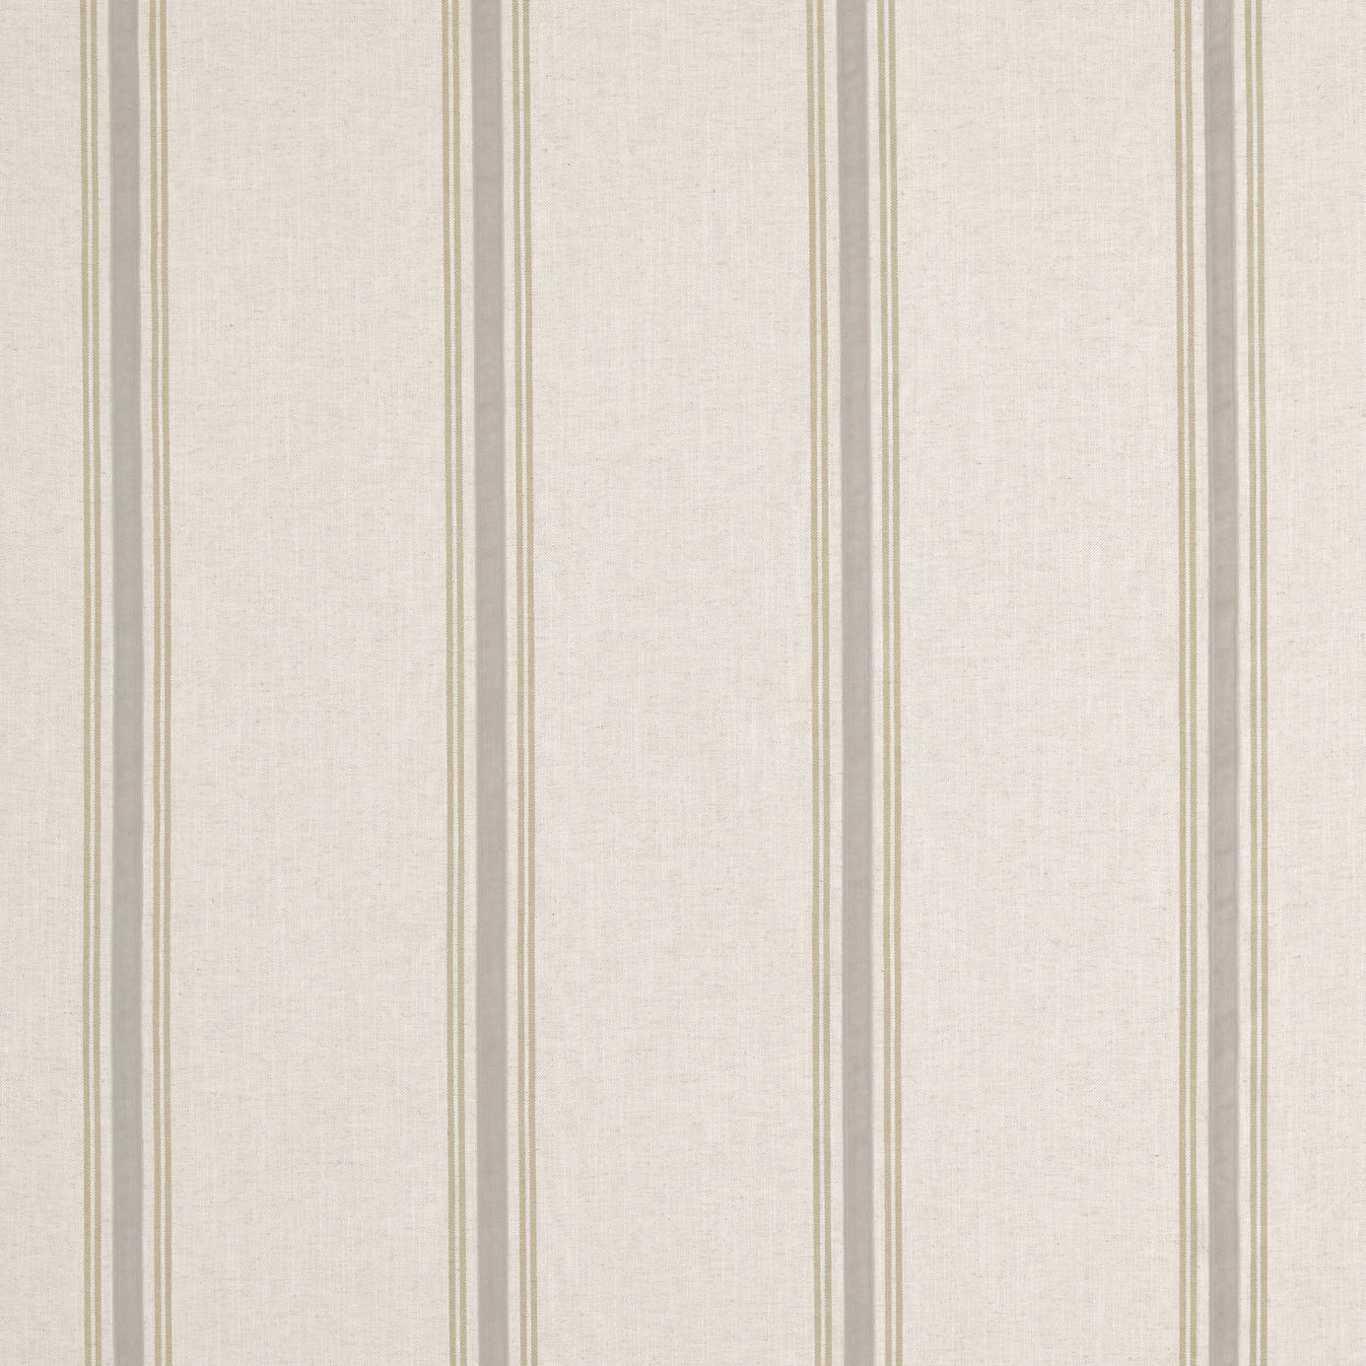 Hockley Stripe by HOM